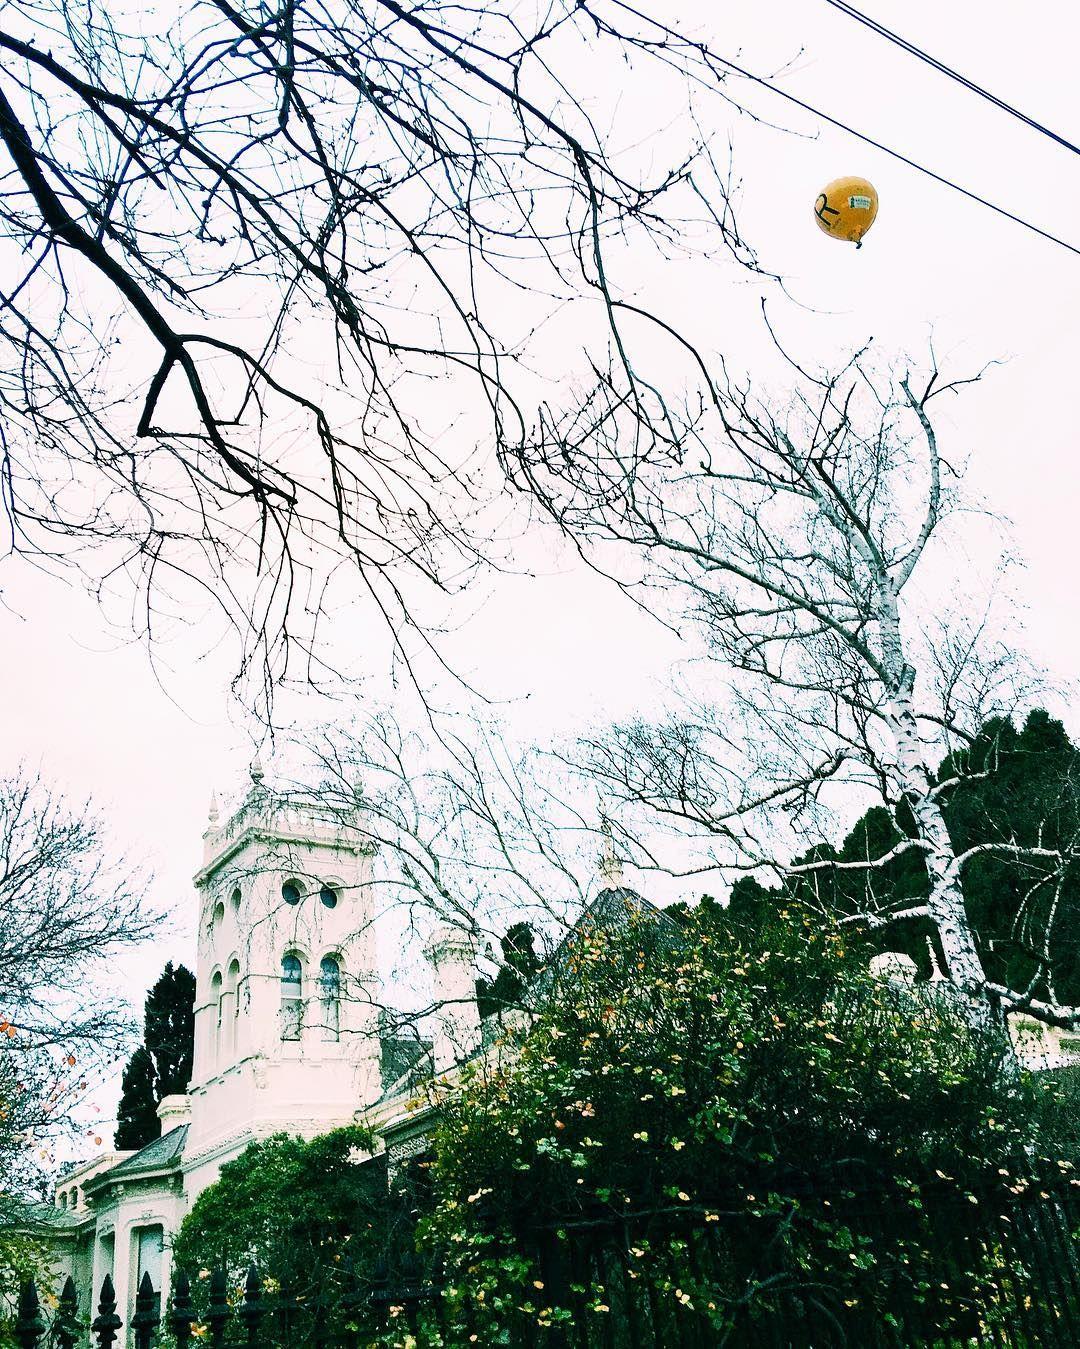 East Hawthorn, Melbourne AUSTRALIA - @lifemoreblessed